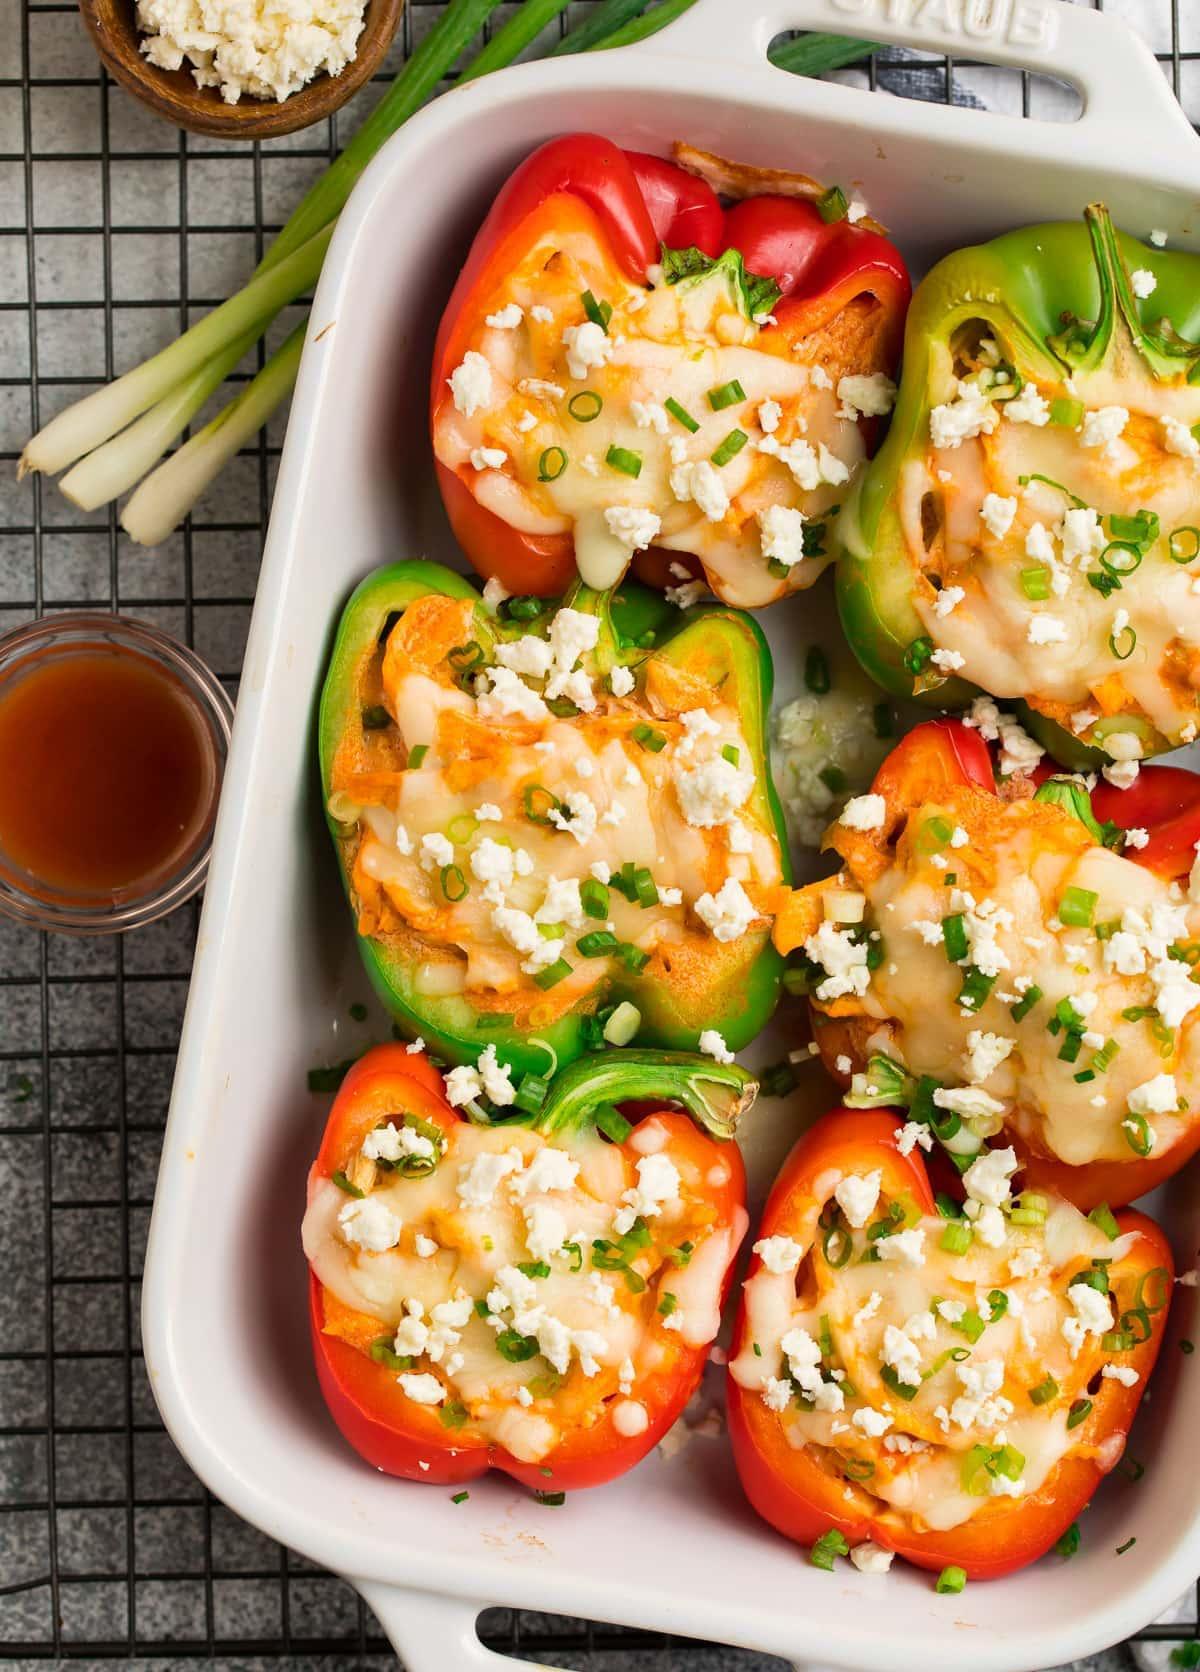 Easy buffalo chicken stuffed peppers in a baking dish